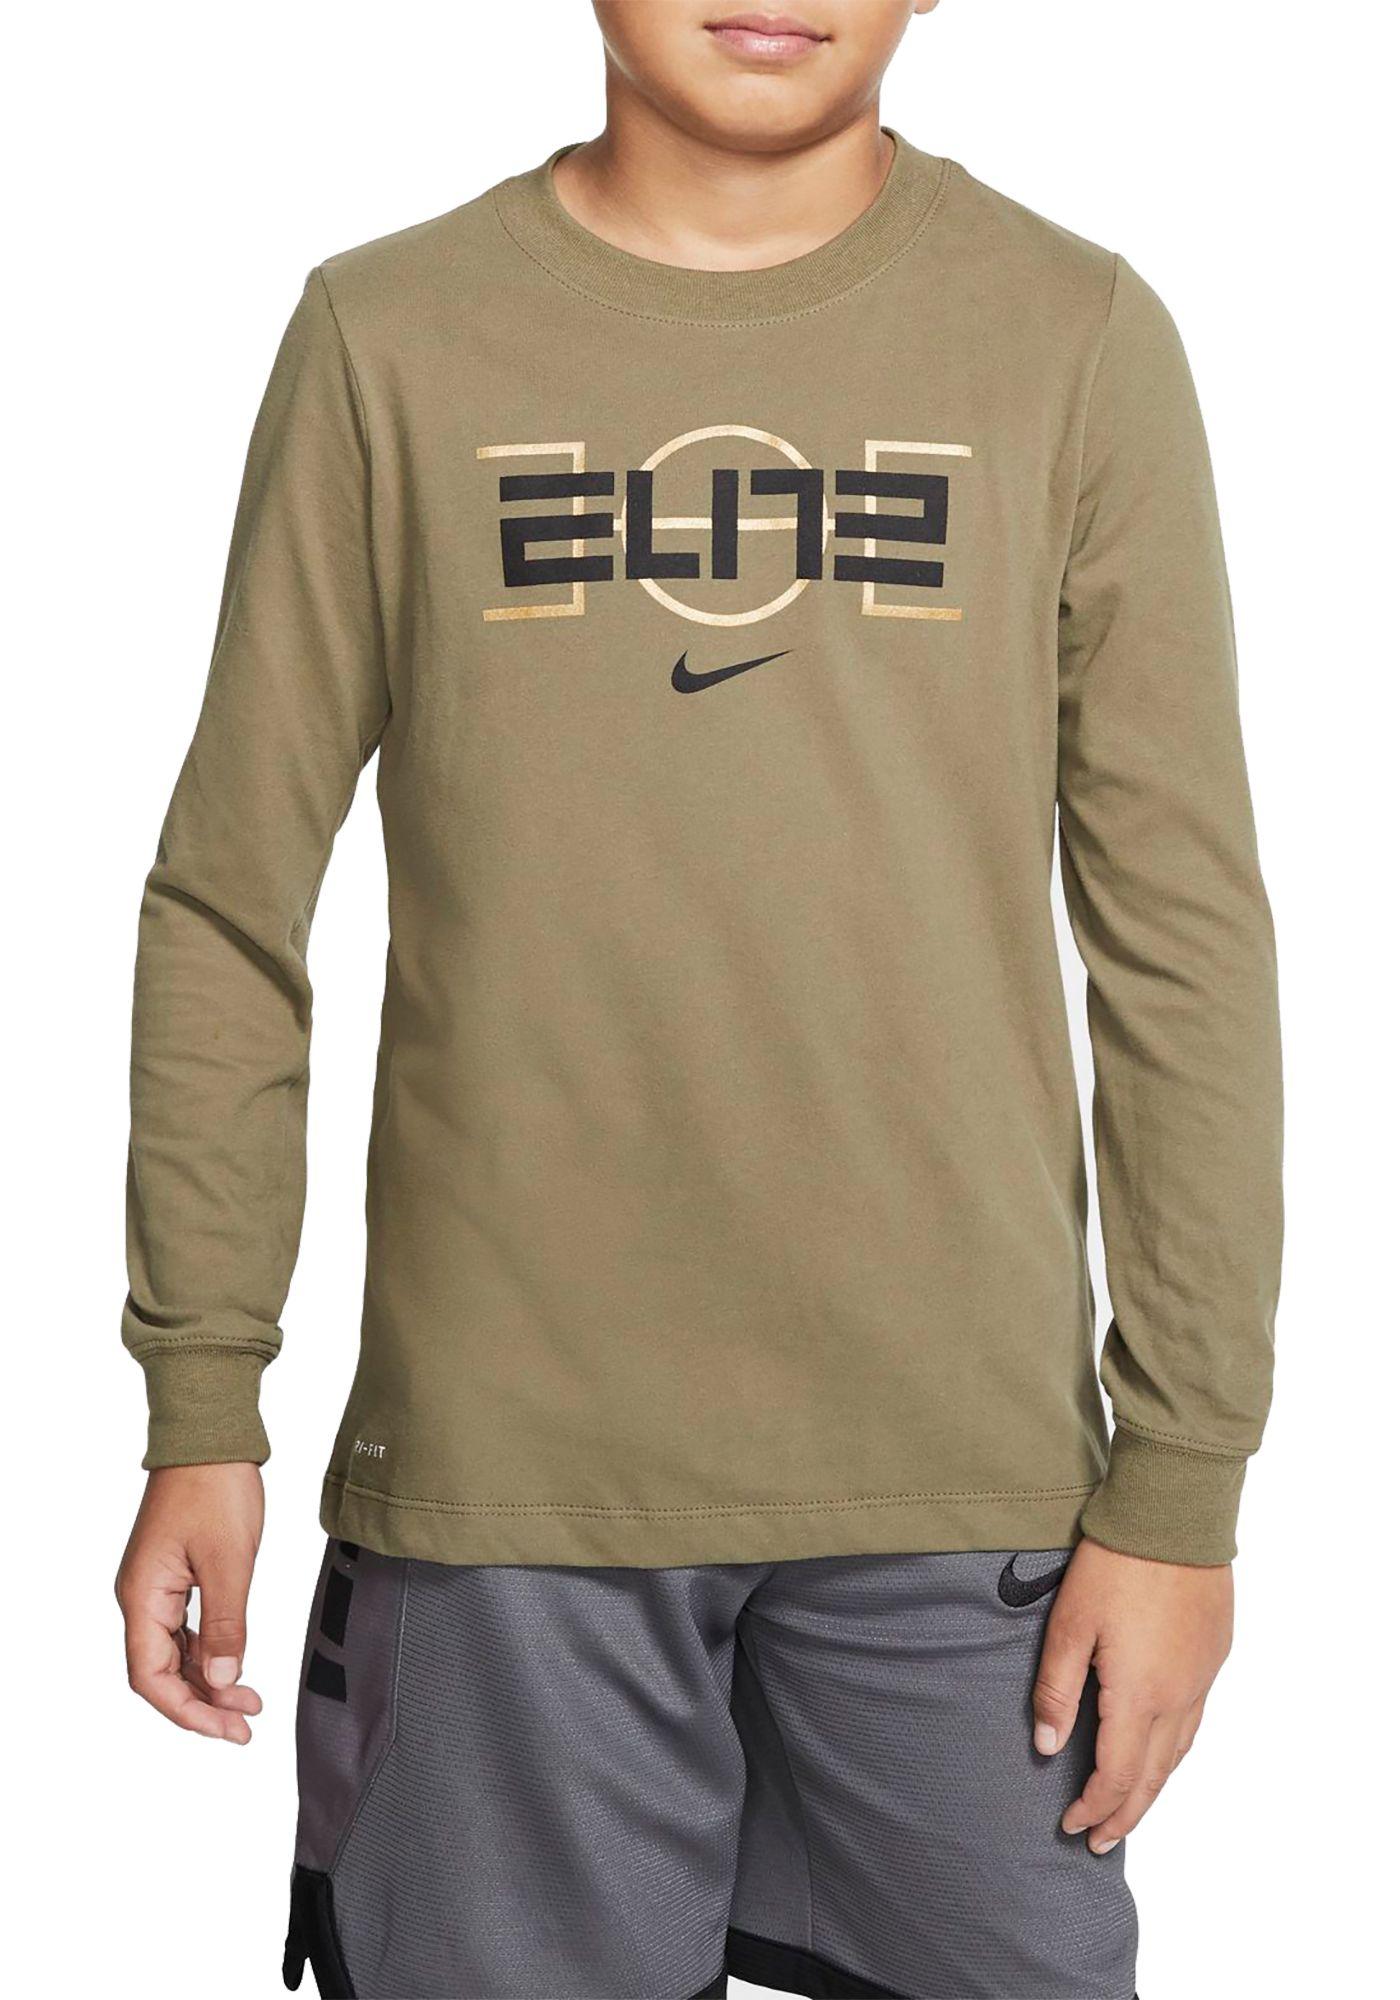 Nike Boys' Dri-FIT Elite Long Sleeve Shirt